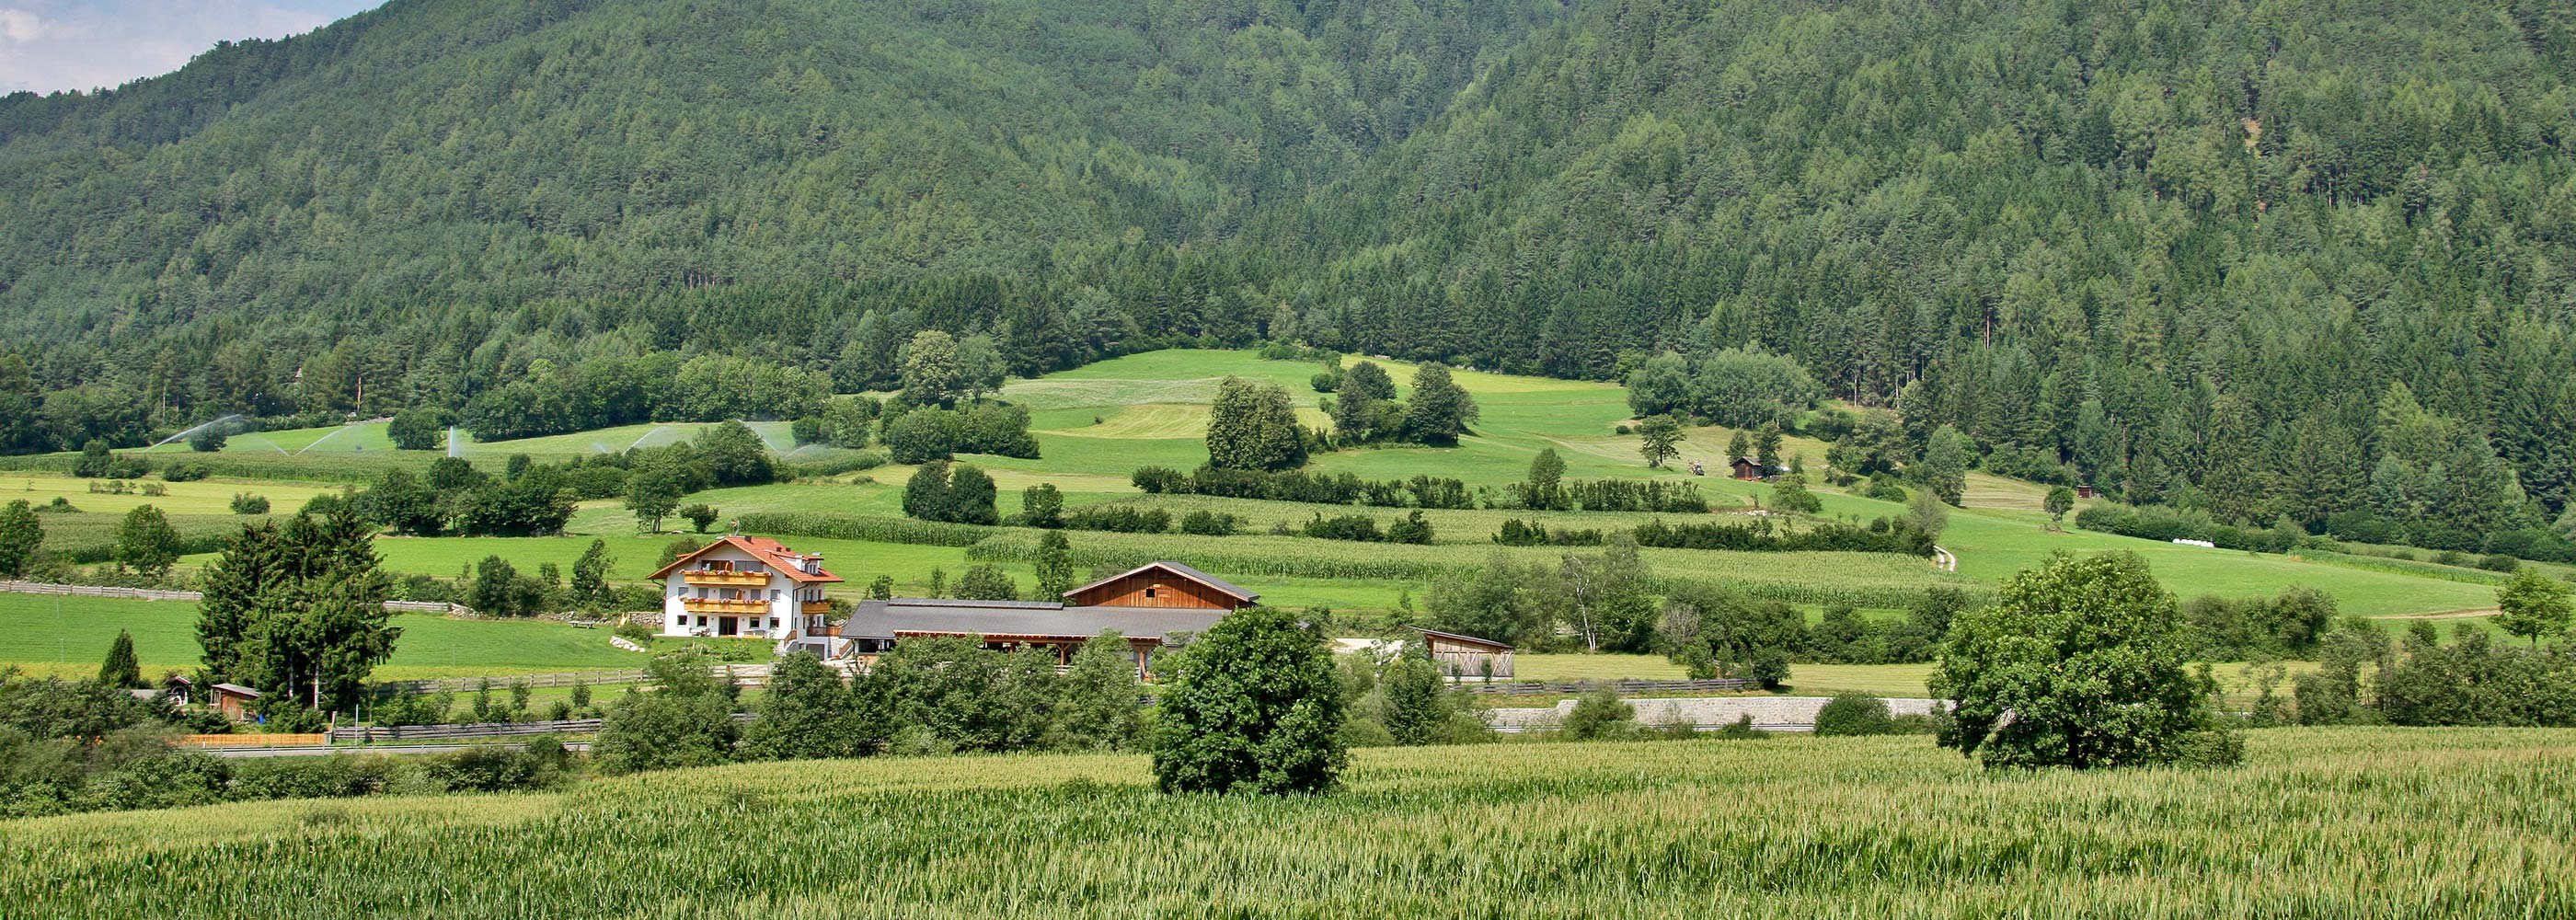 pano-impressions-farm-vacation-south-tyrol